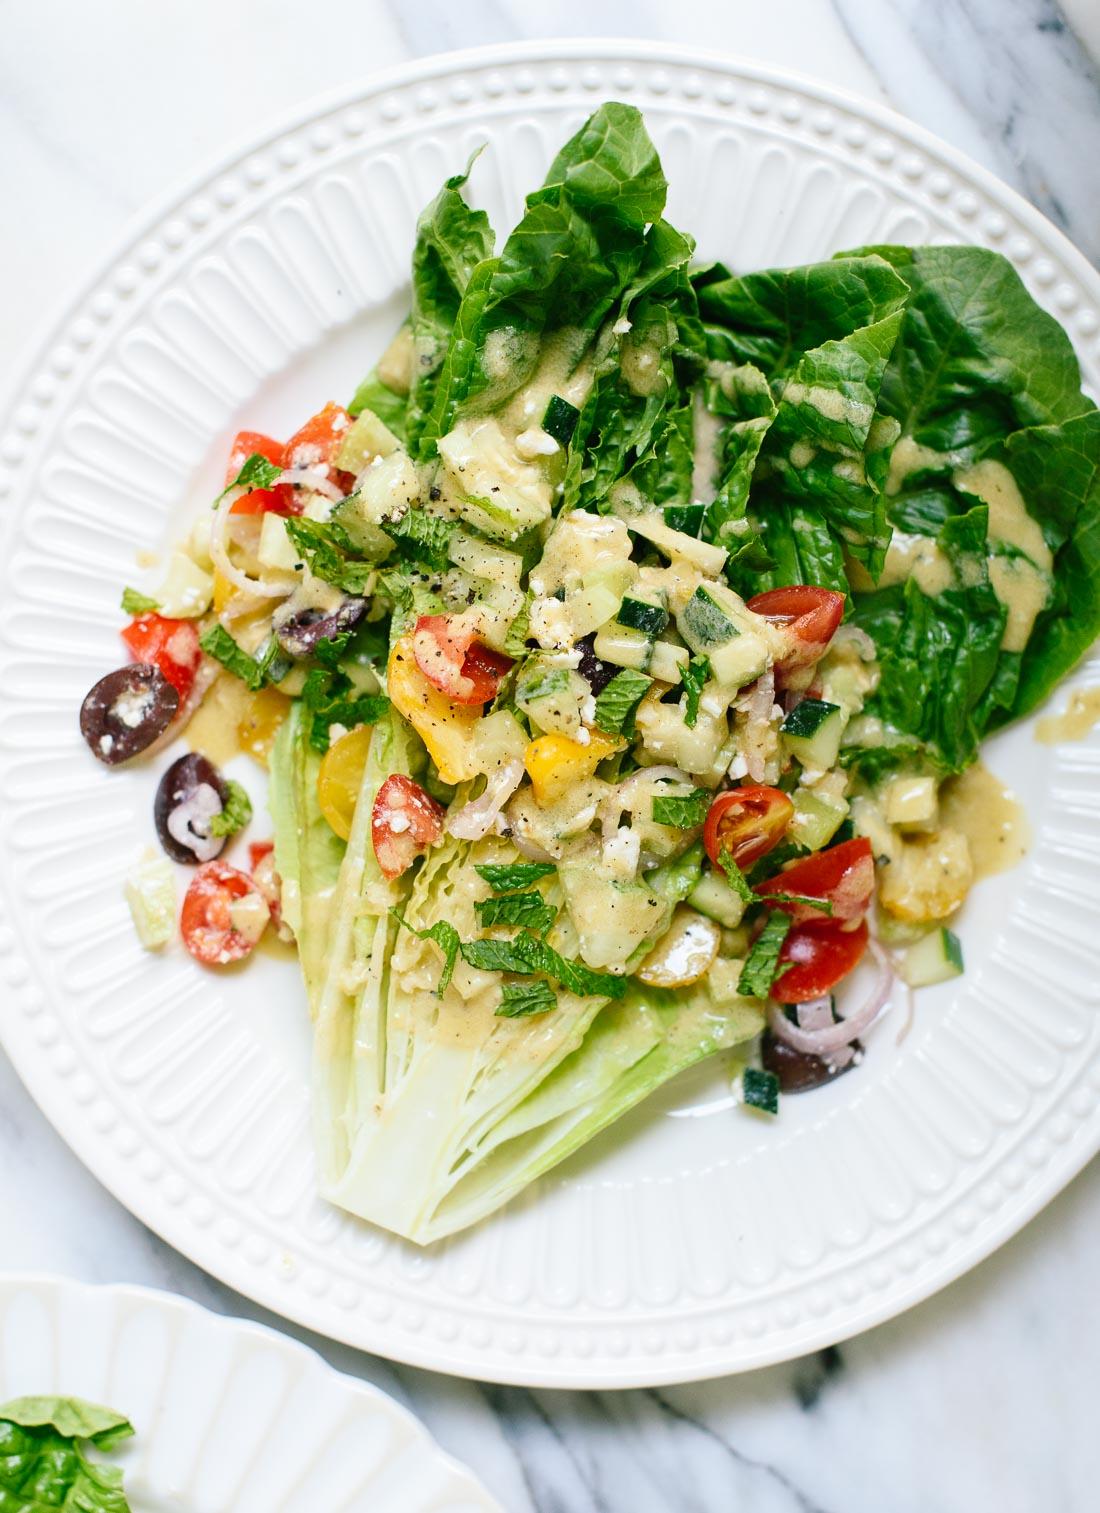 greek-wedge-salad-recipe